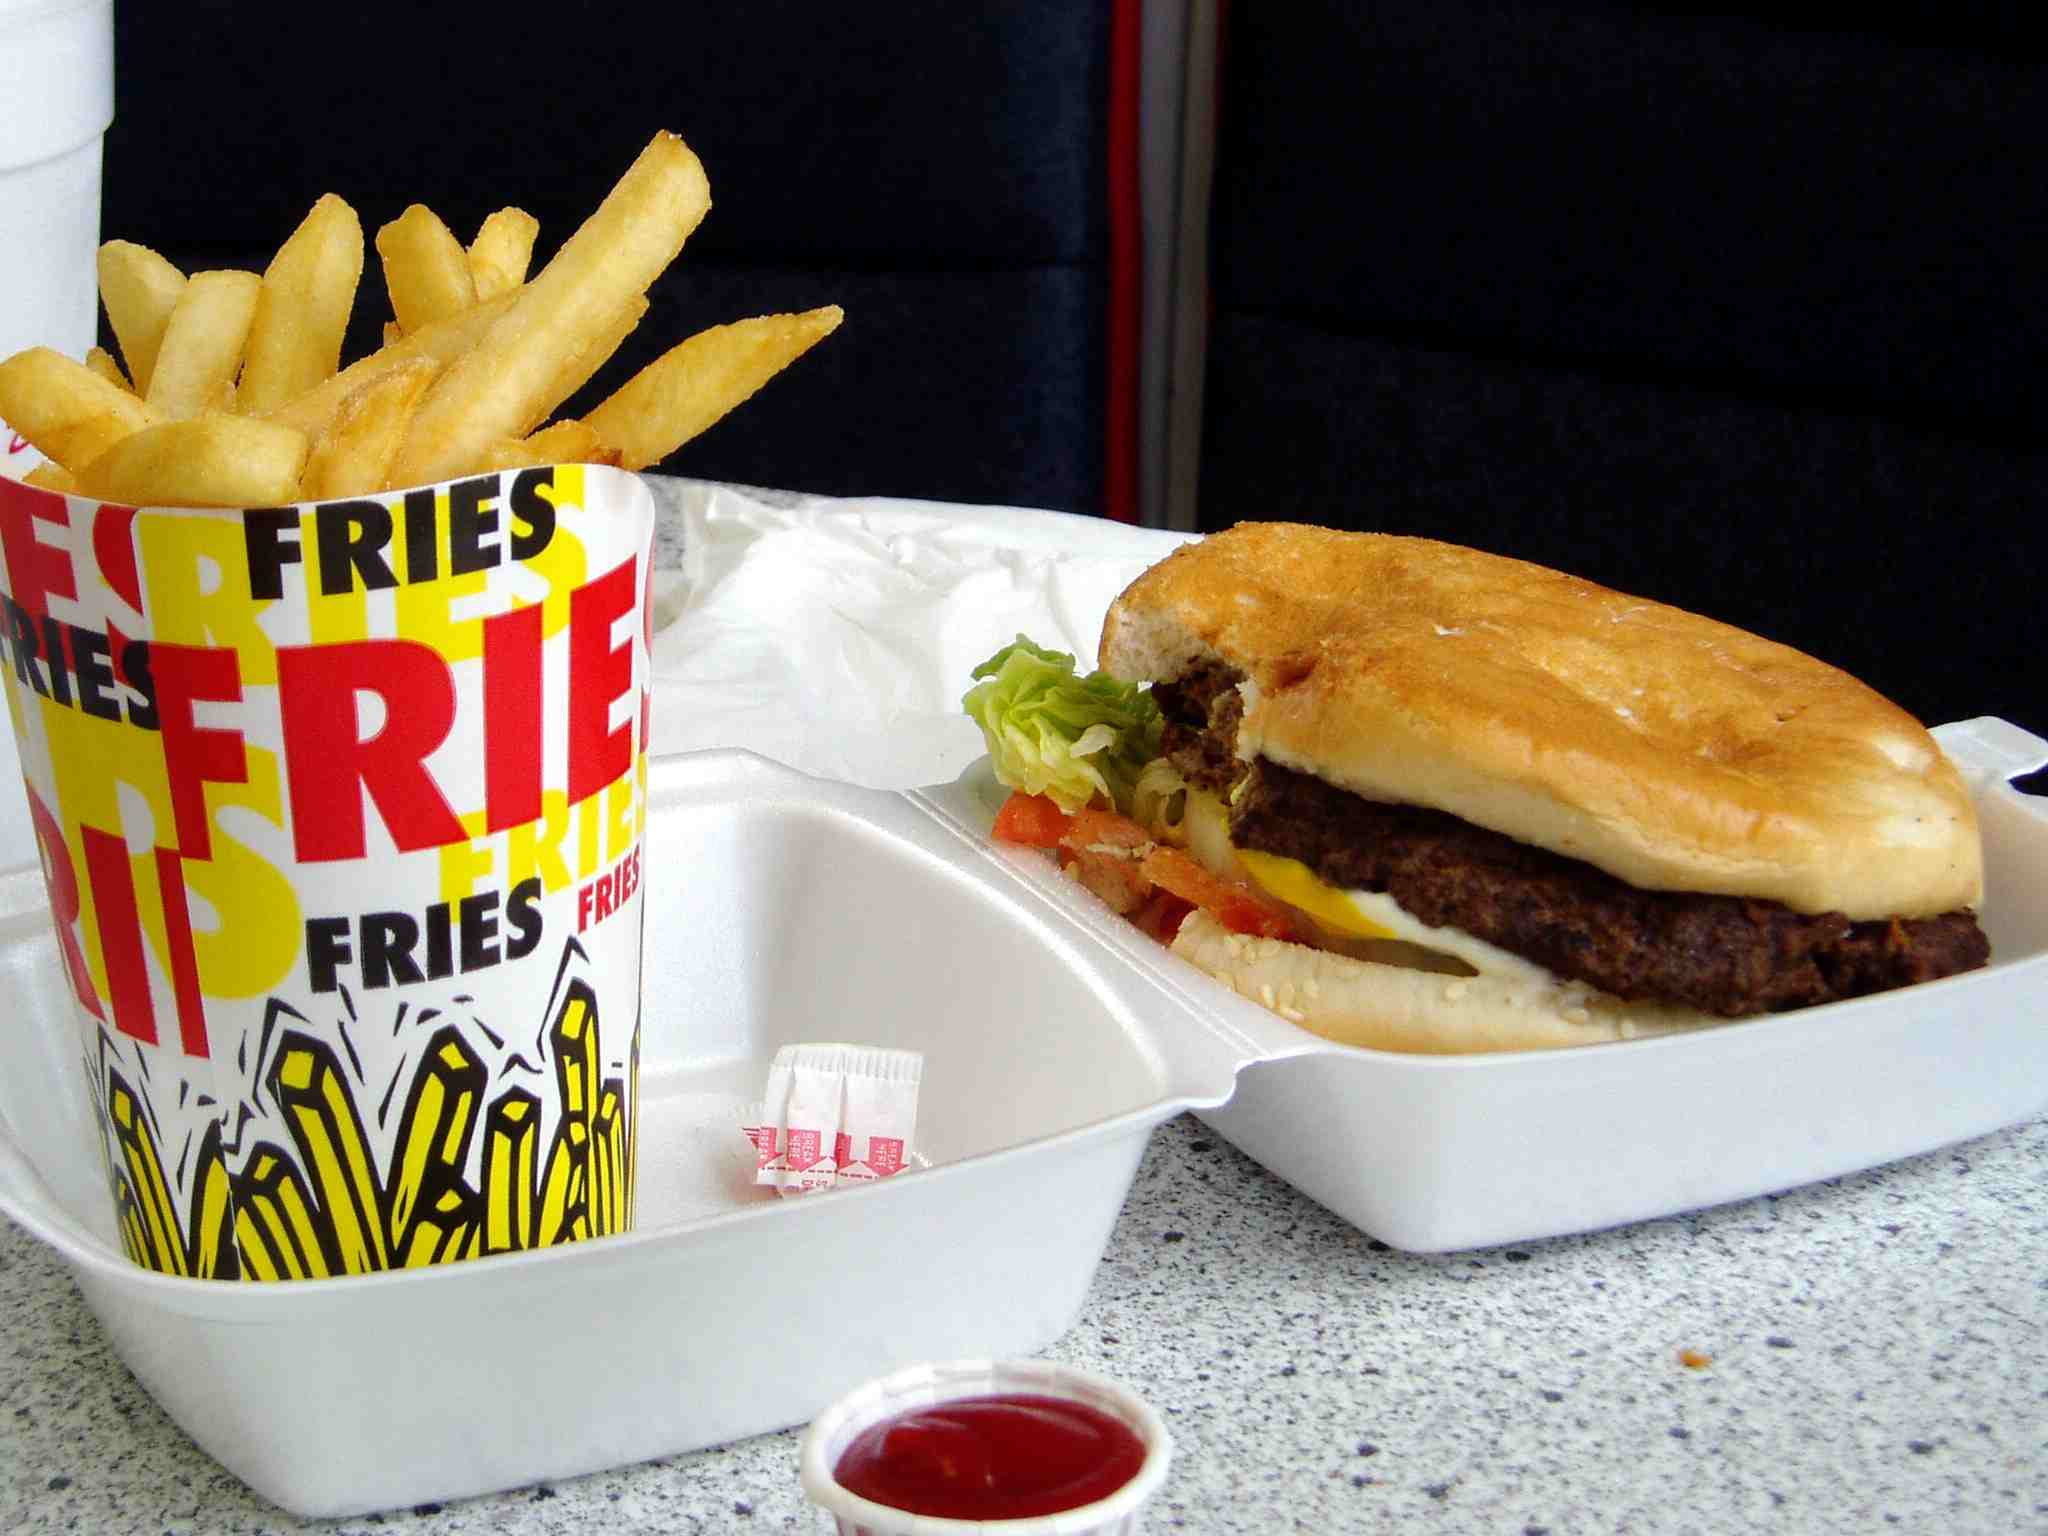 Fast food per l'autosvezzamento?